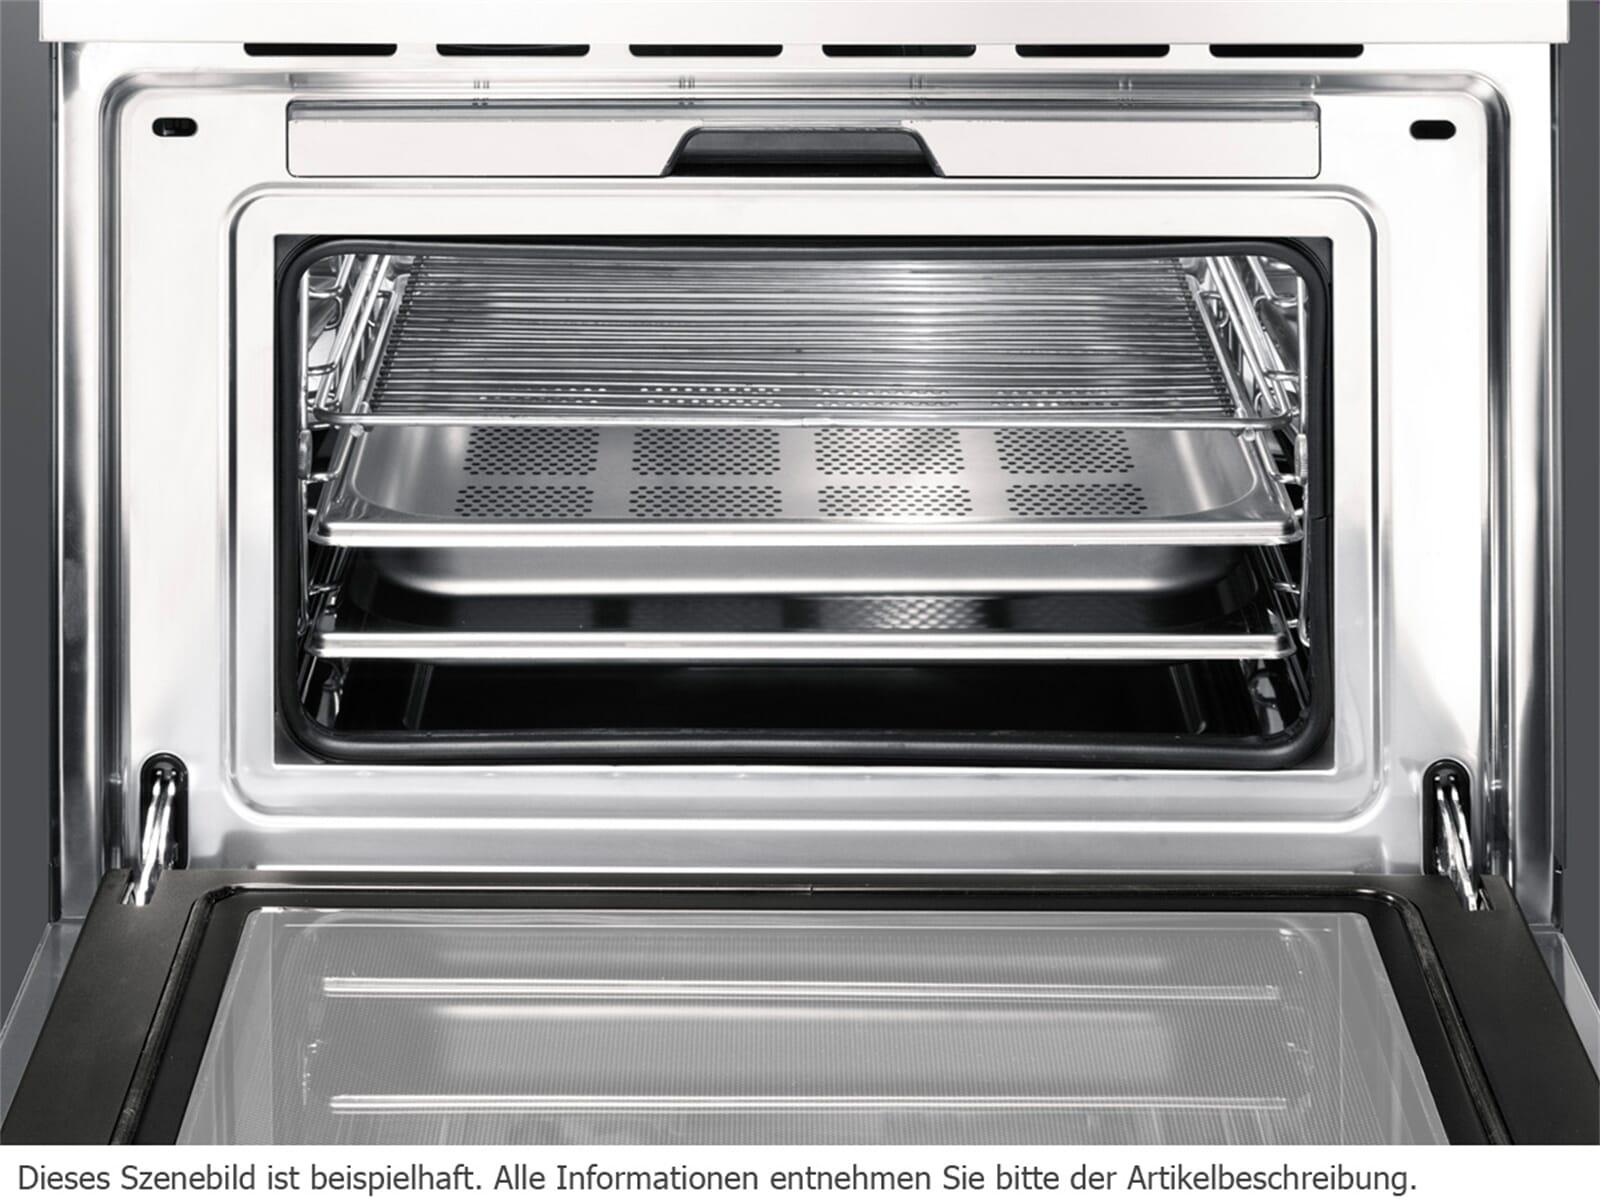 Smeg SC45VB2 Kompakt Dampfgarer Weiß für 1139,00 EUR